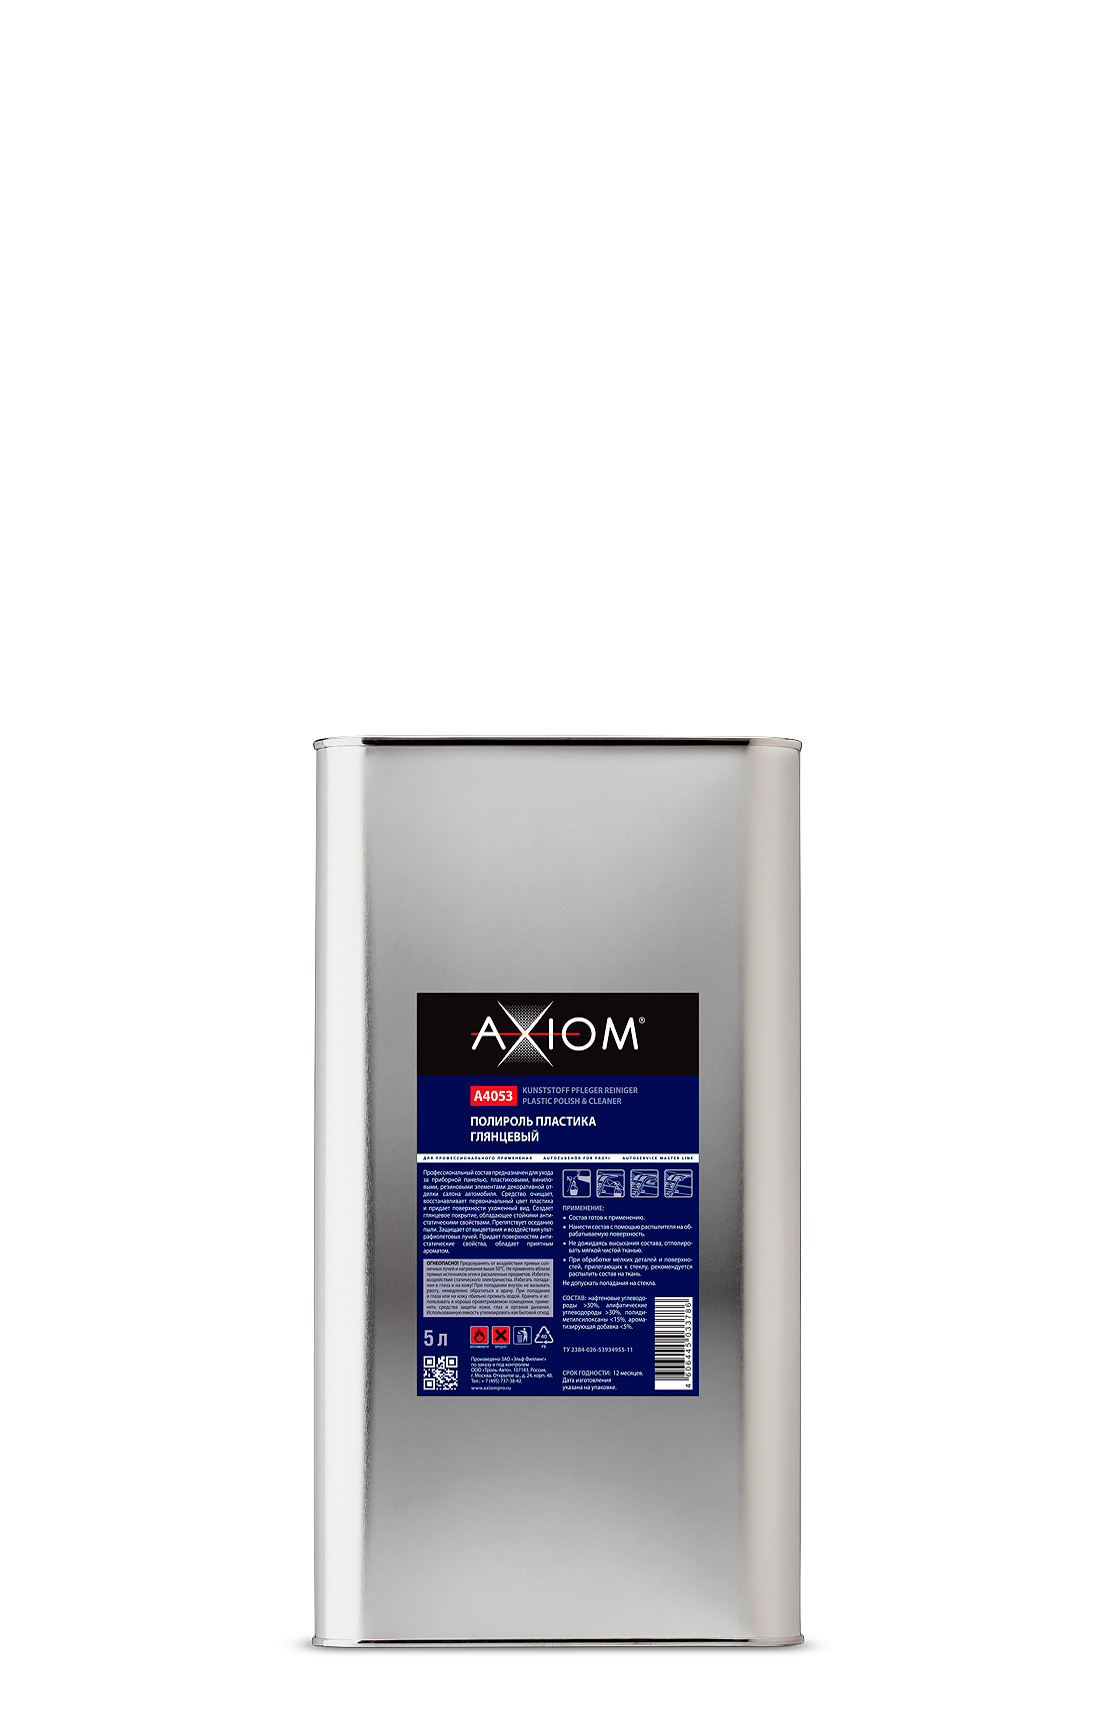 Полироль пластика глянцевый 5 л. AXIOM (A4053)